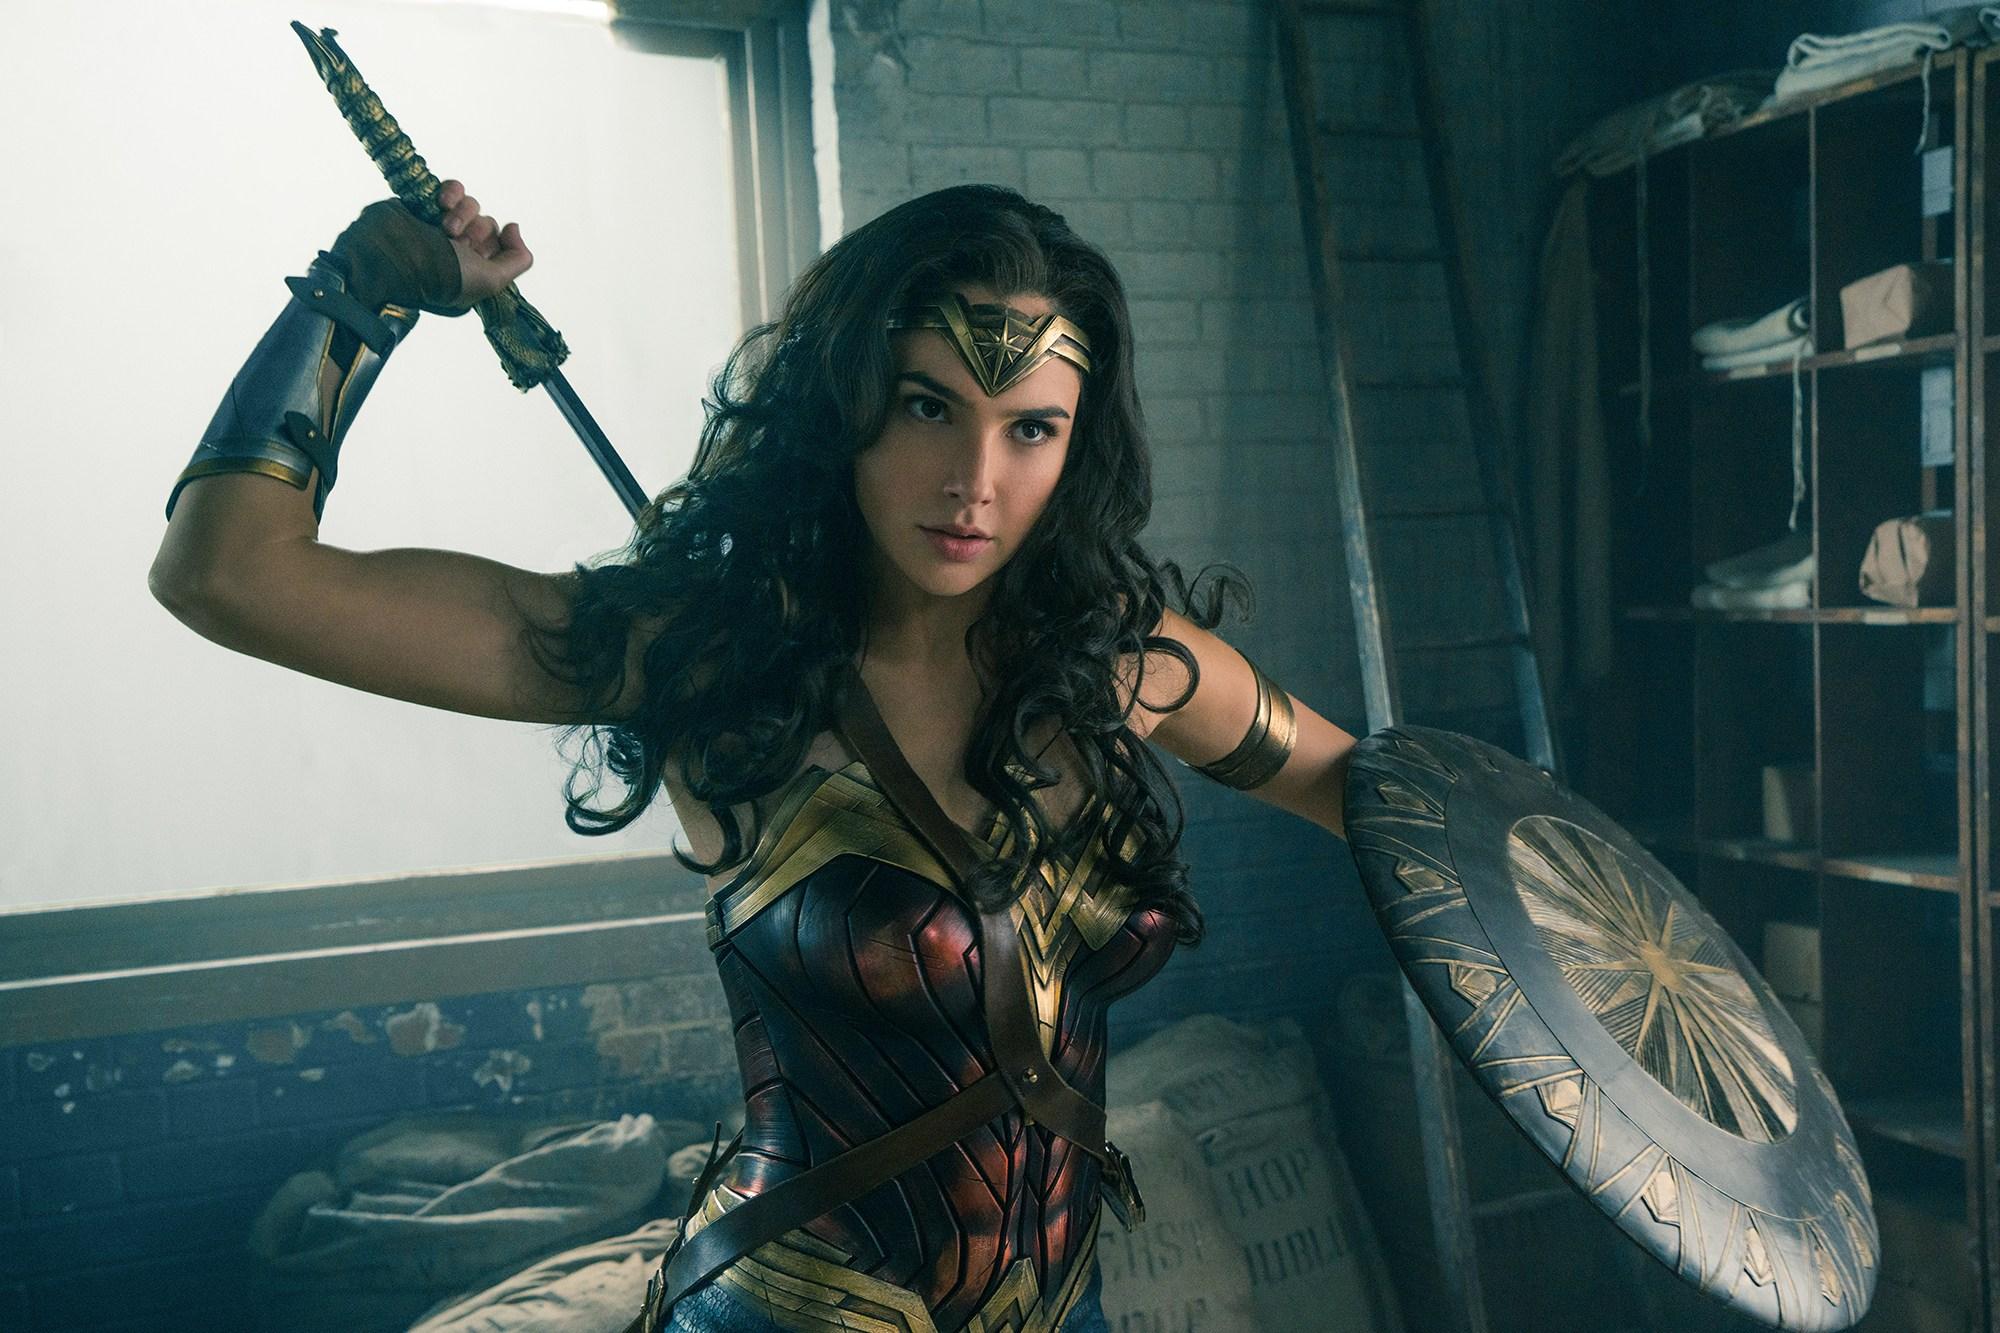 Wonder Woman lassoes true in fight against evil